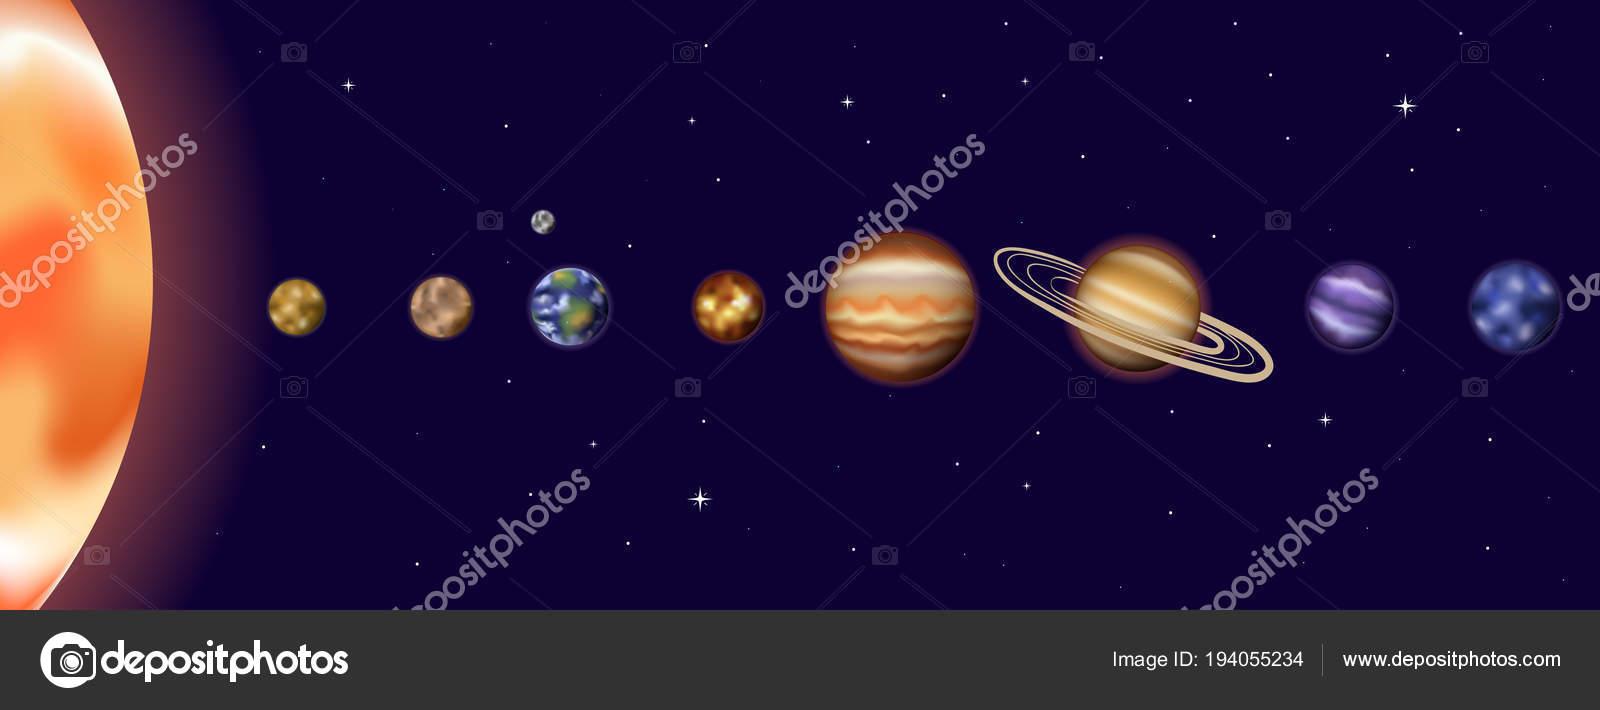 hight resolution of vector illustration of sun system with sun mercury venus earth moon mars jupiter saturn uranus neptune diagram with order of planet orbit